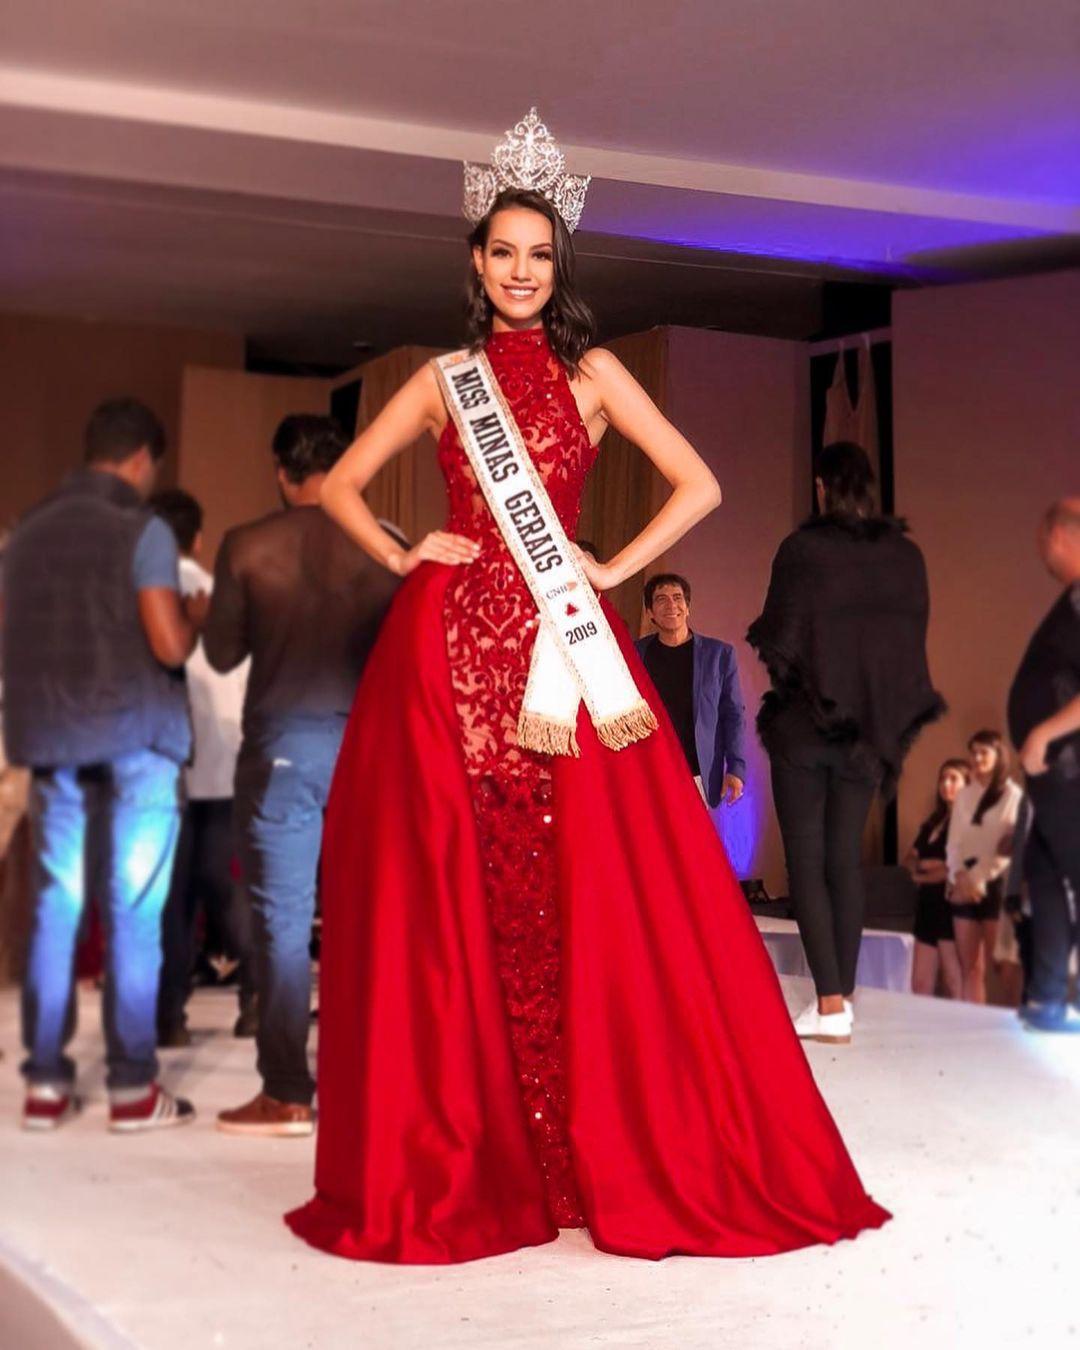 rafaella felipe, top 20 de miss brasil mundo 2019. - Página 9 72135810